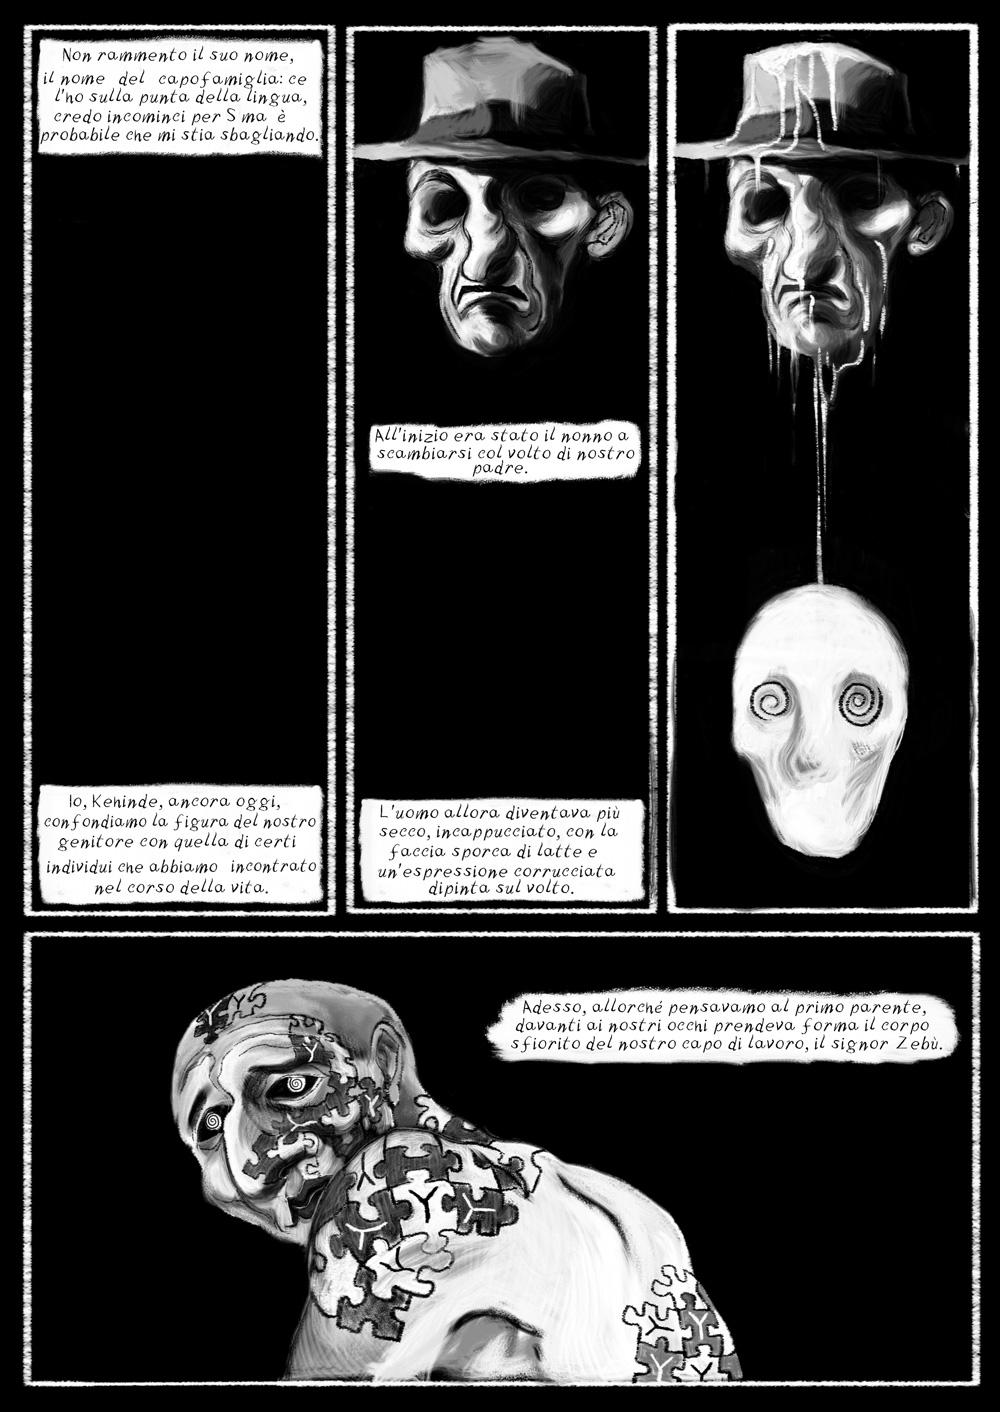 Uno In Diviso - Pagina 034